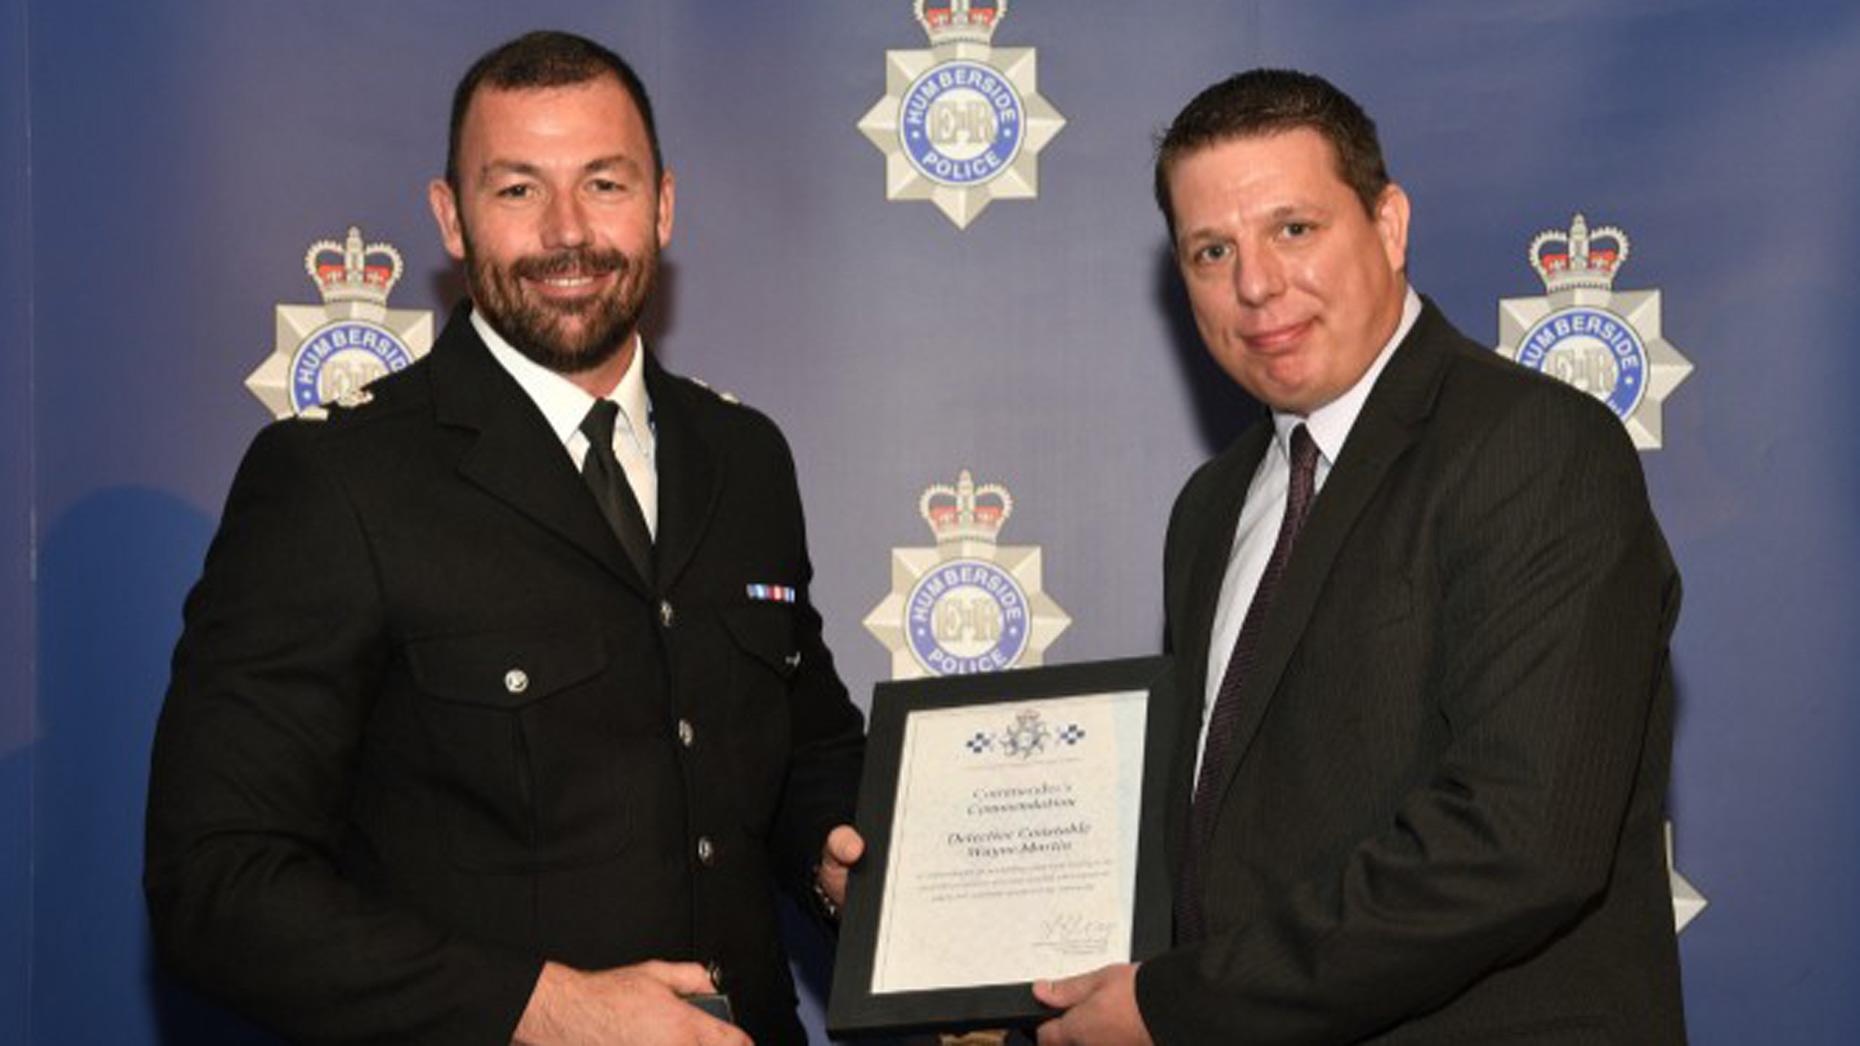 DC Wayne Martin from Grimsby also won an award